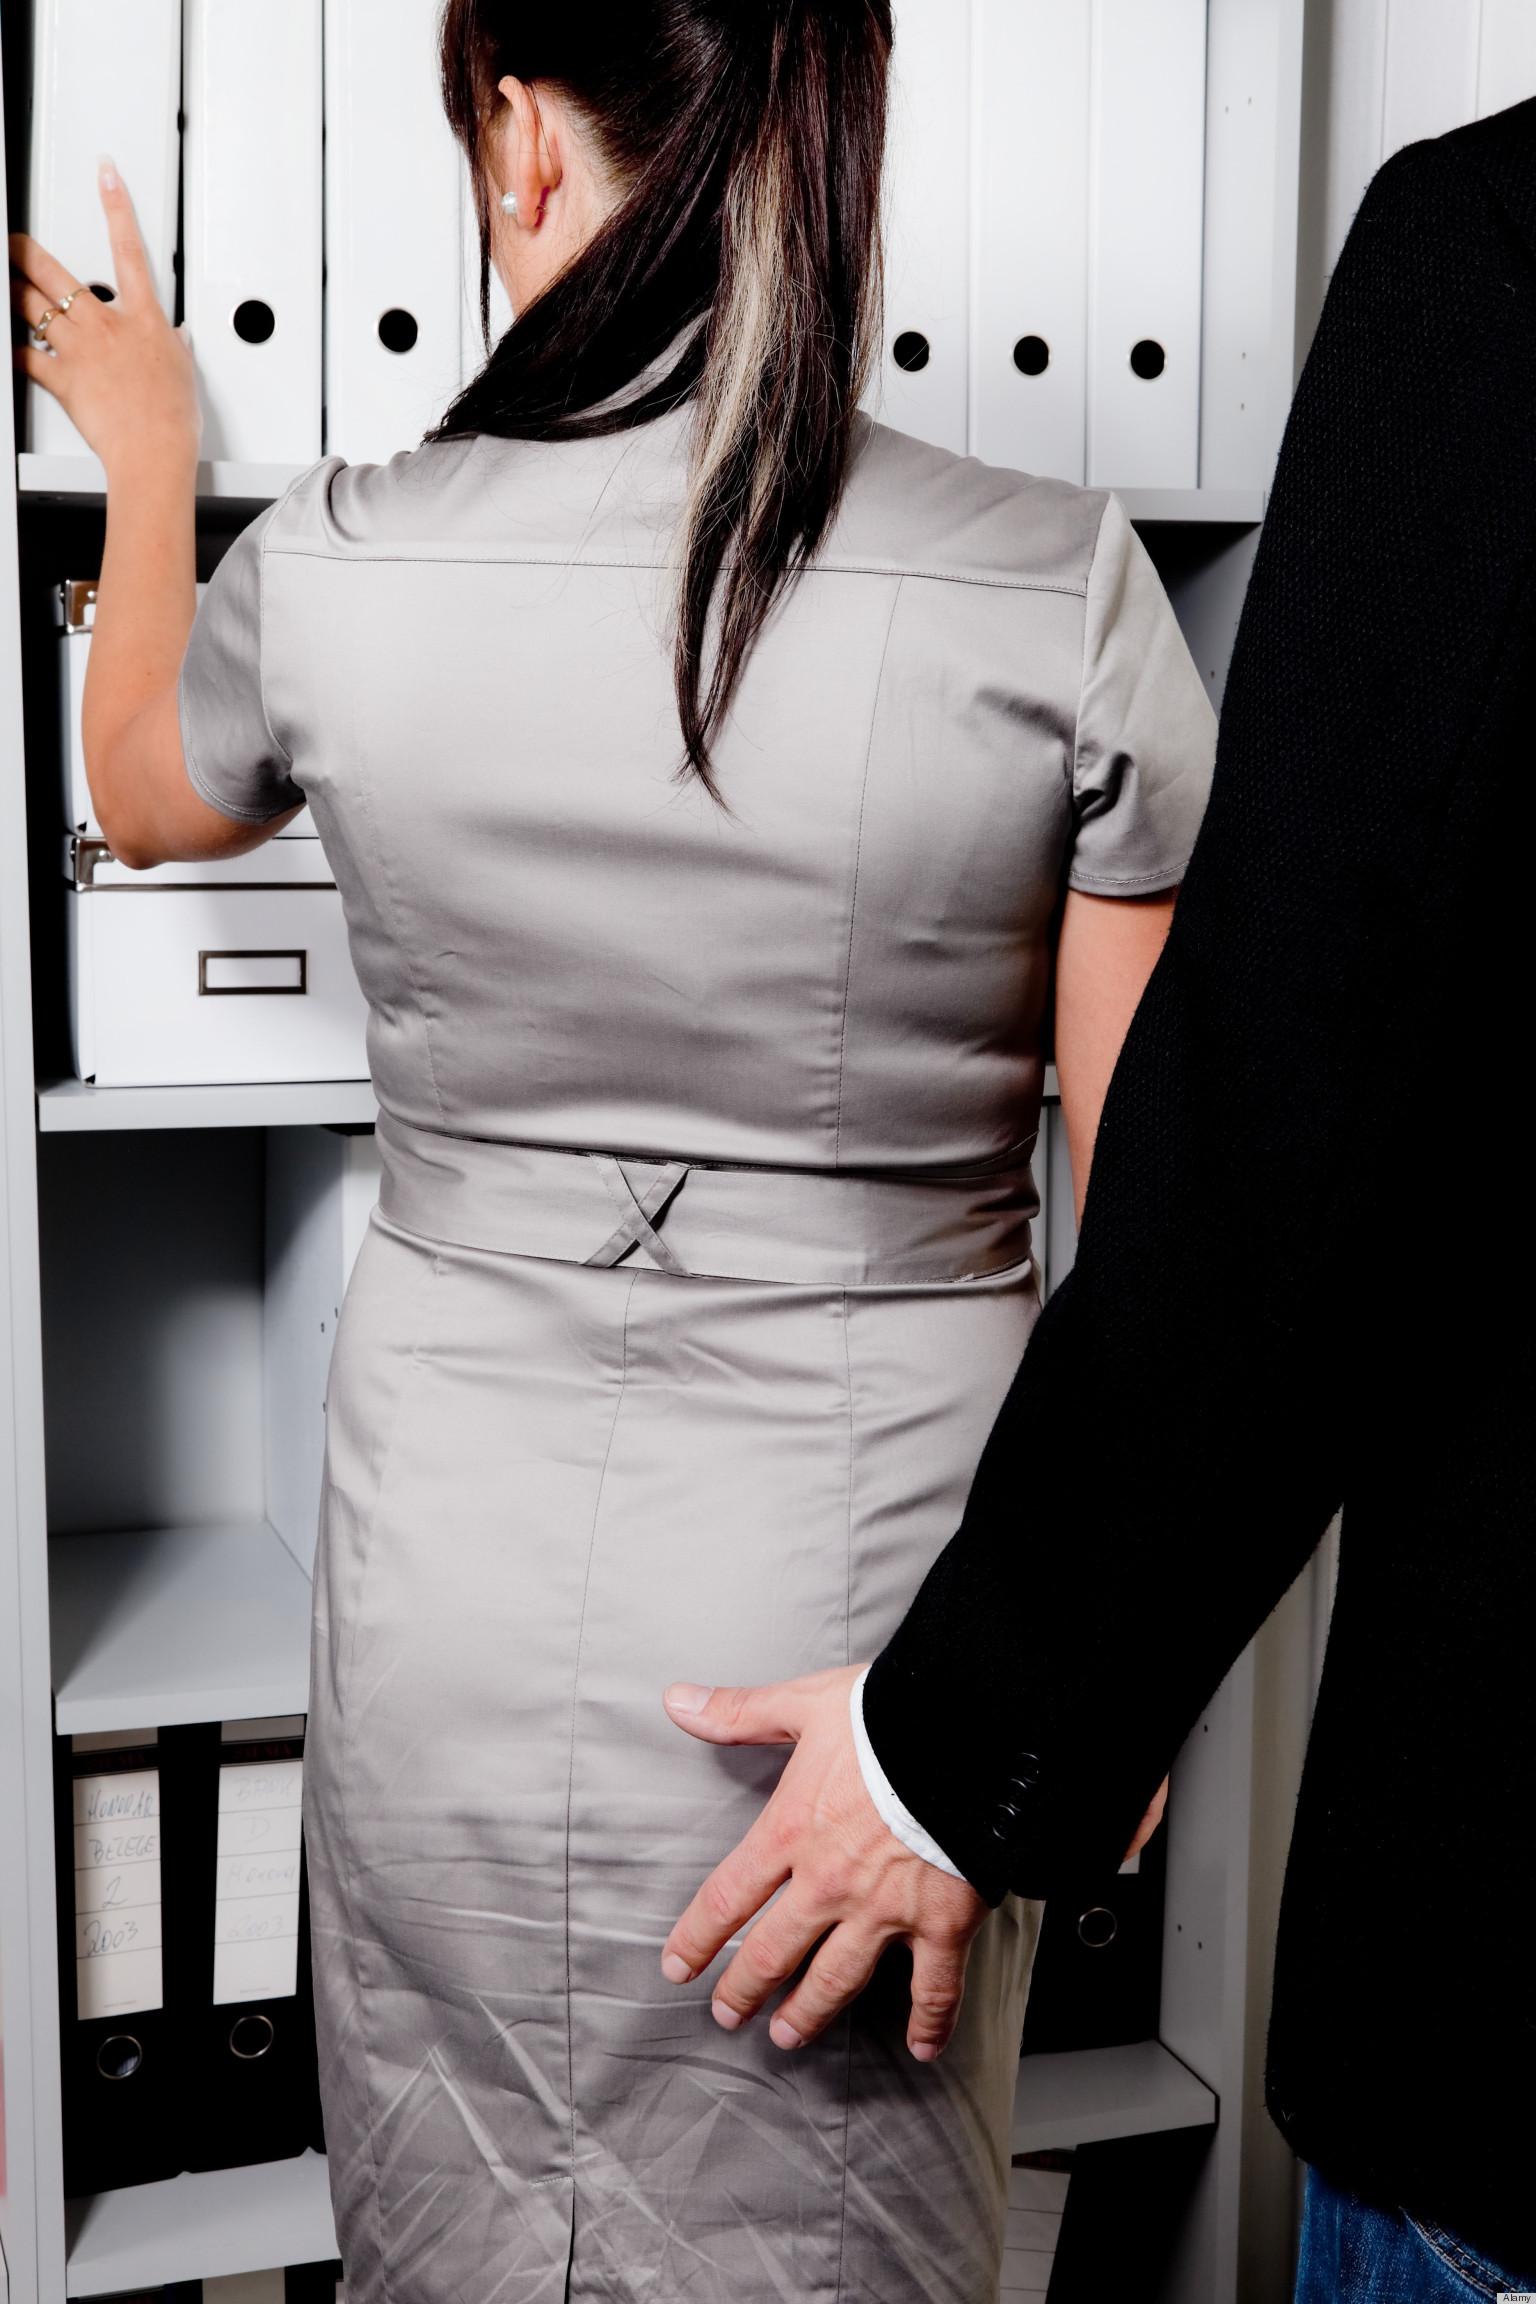 Sexual harassment case studies uk